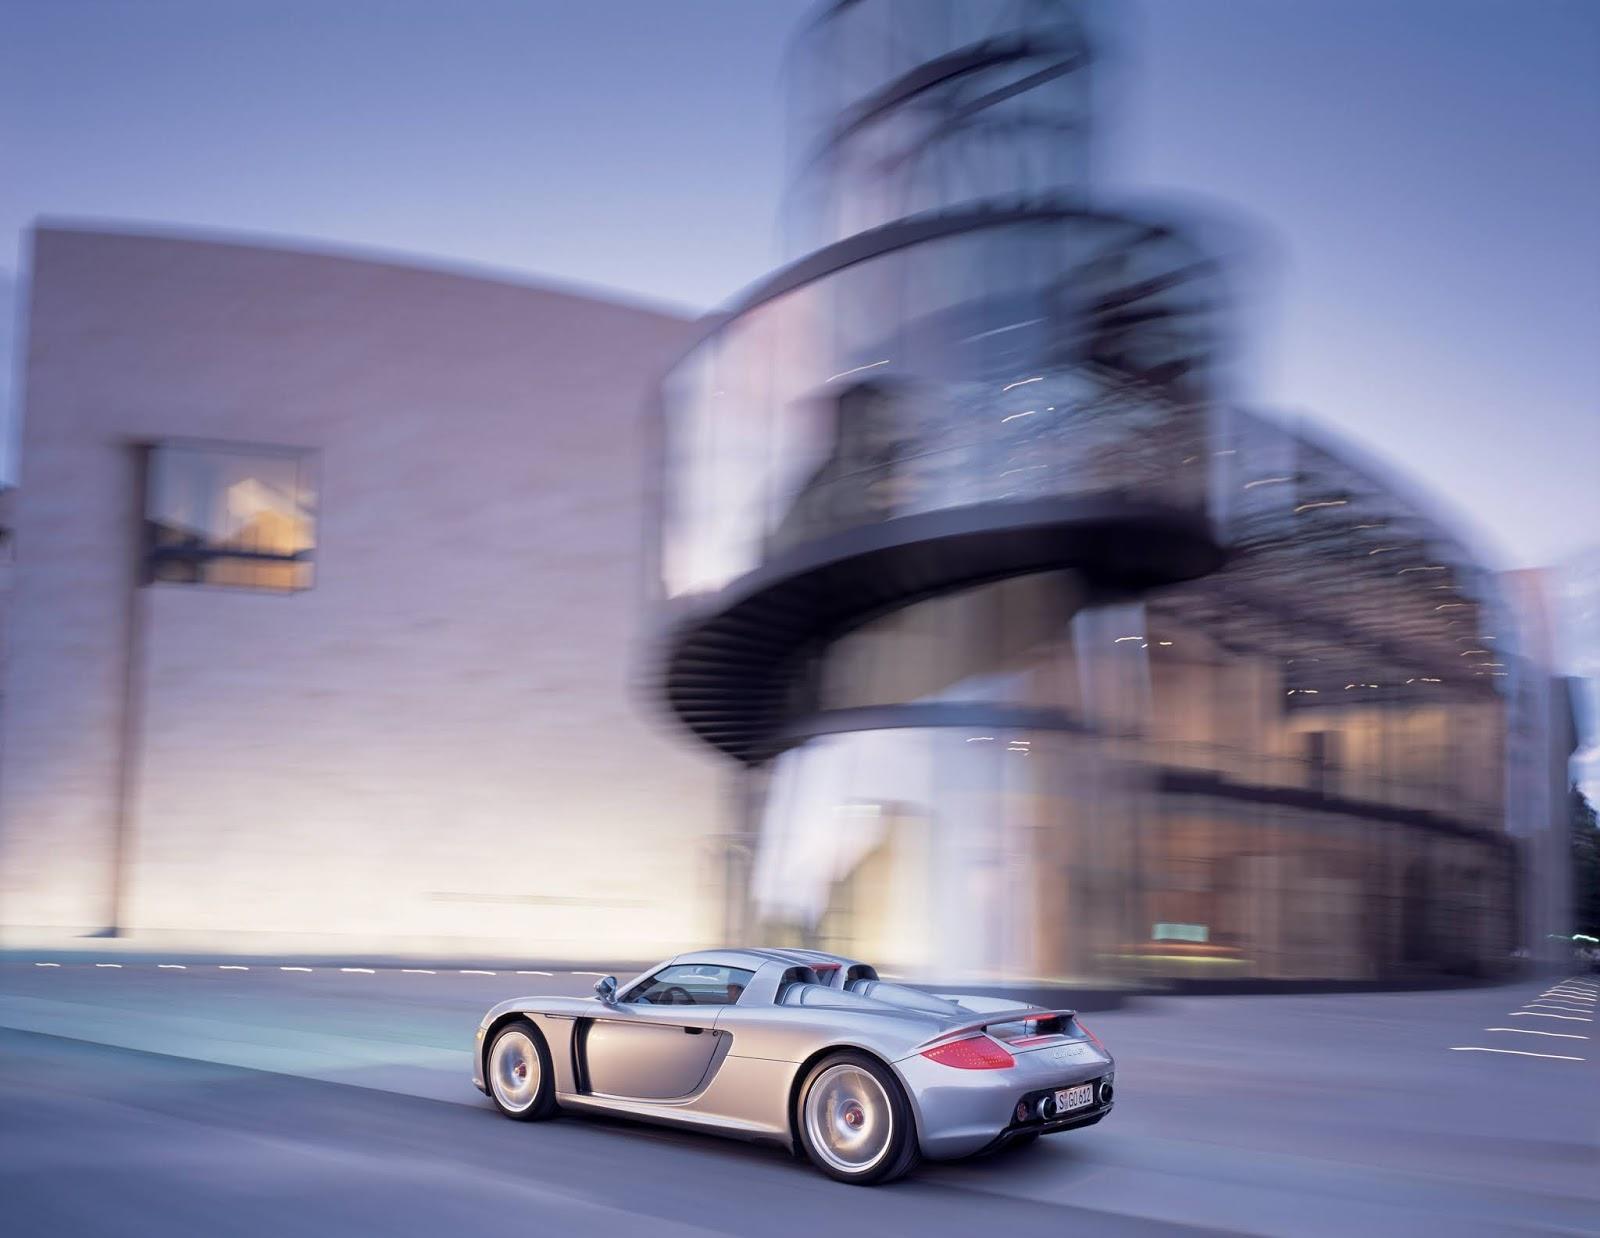 P03 1150 a4 Porsche Carrera GT : Ένα αγωνιστικό LeMans, για το δρόμο Carrera GT, Porsche, Porsche Carrera GT, retrocar, retrocar sunday, supercar, zblog